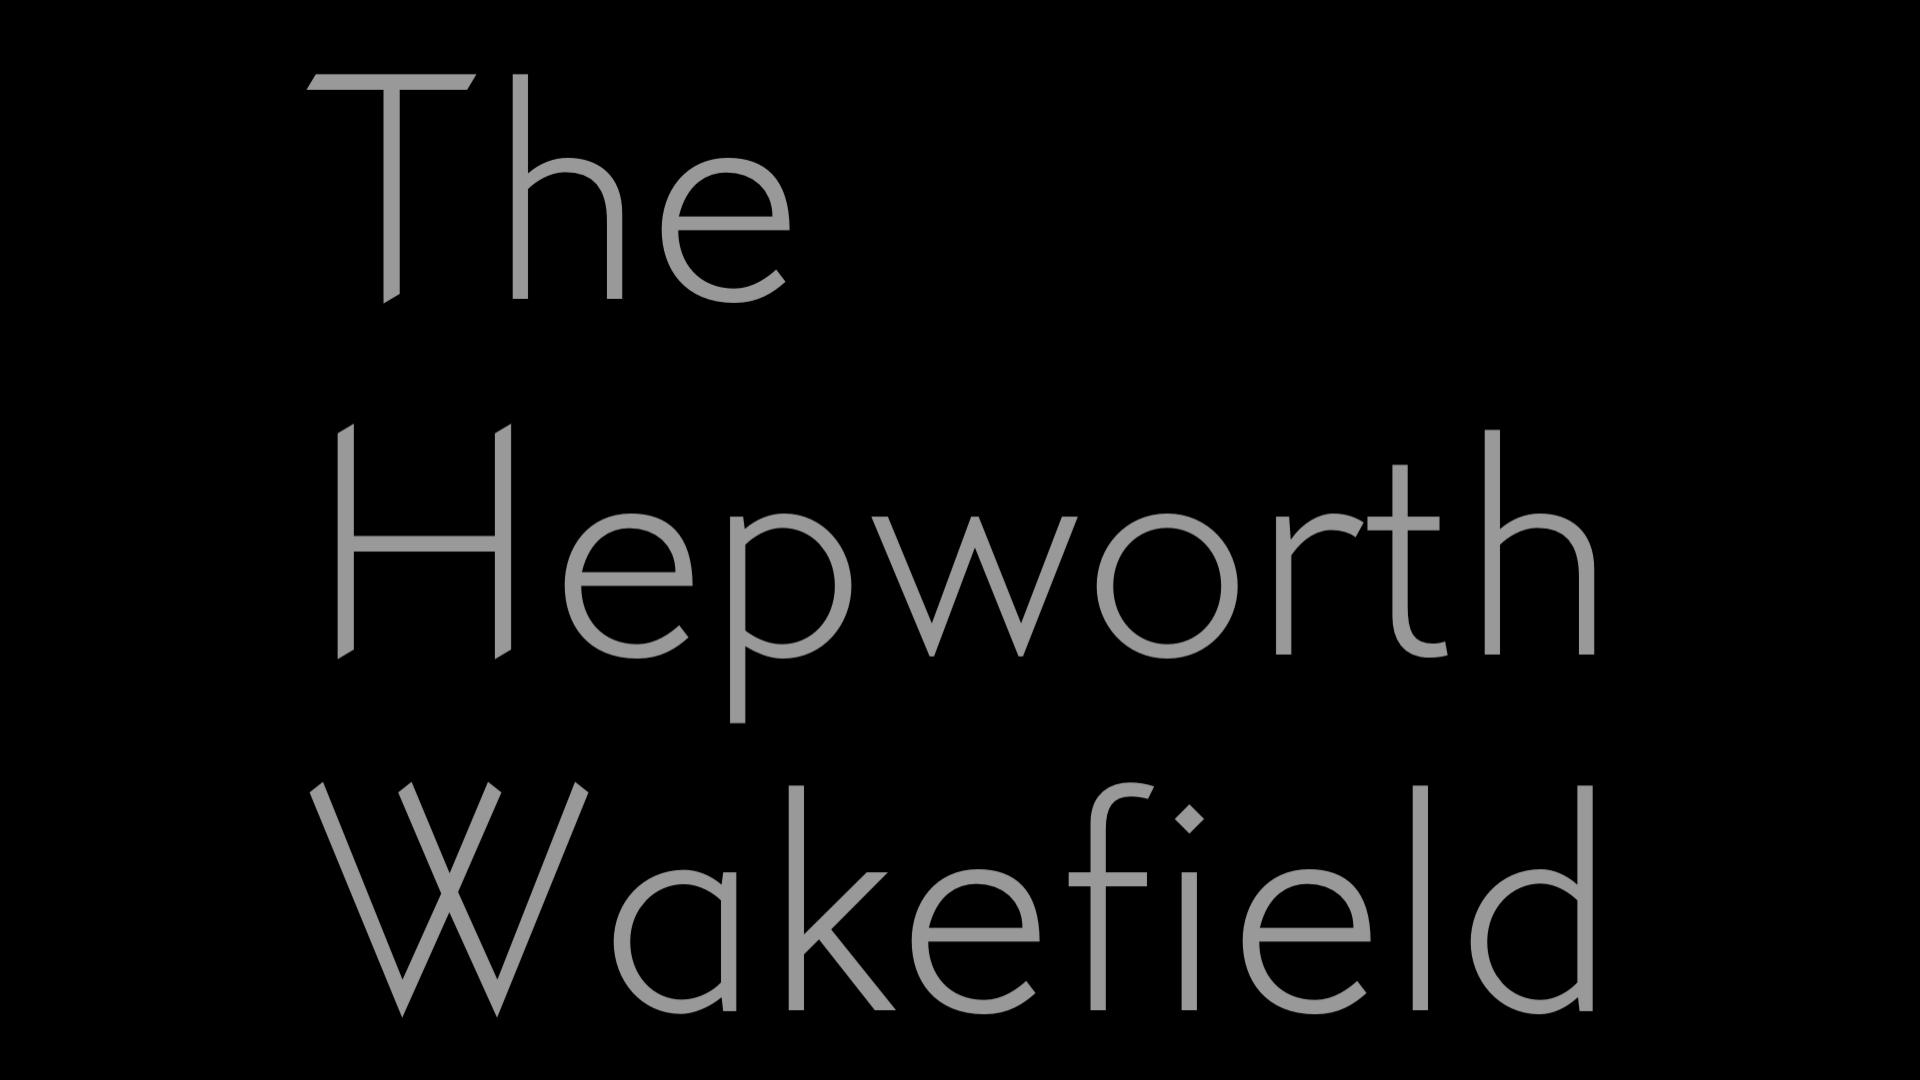 Hepworth greyscaled.png